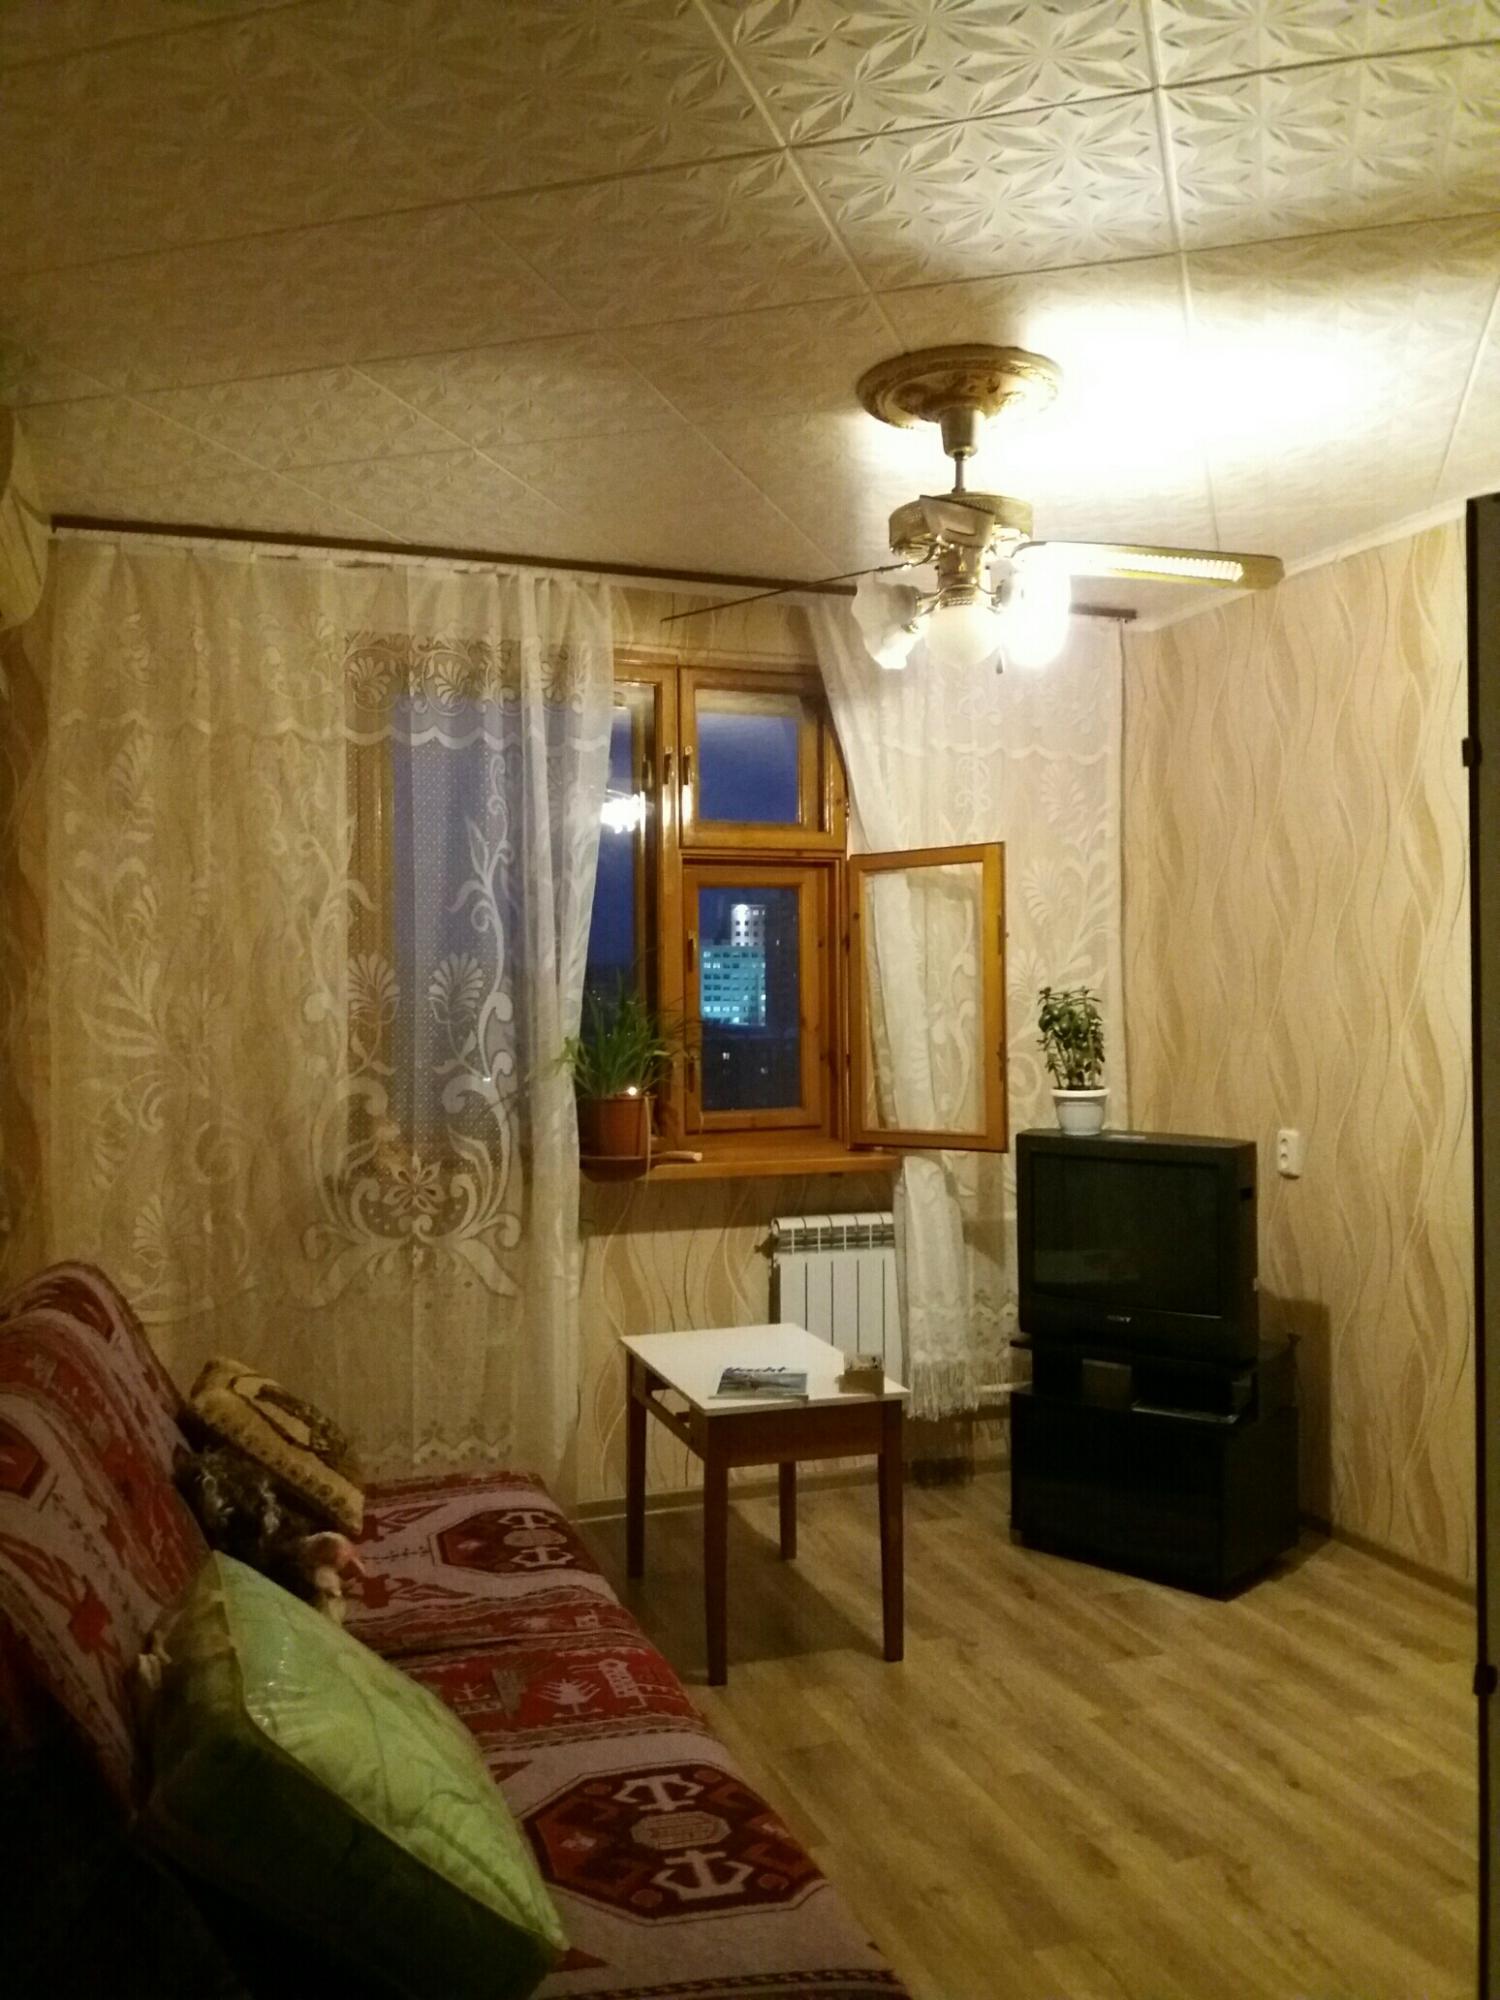 Аренда 1-комнатной квартиры, г. Тольятти, Степана Разина проспект  дом 34